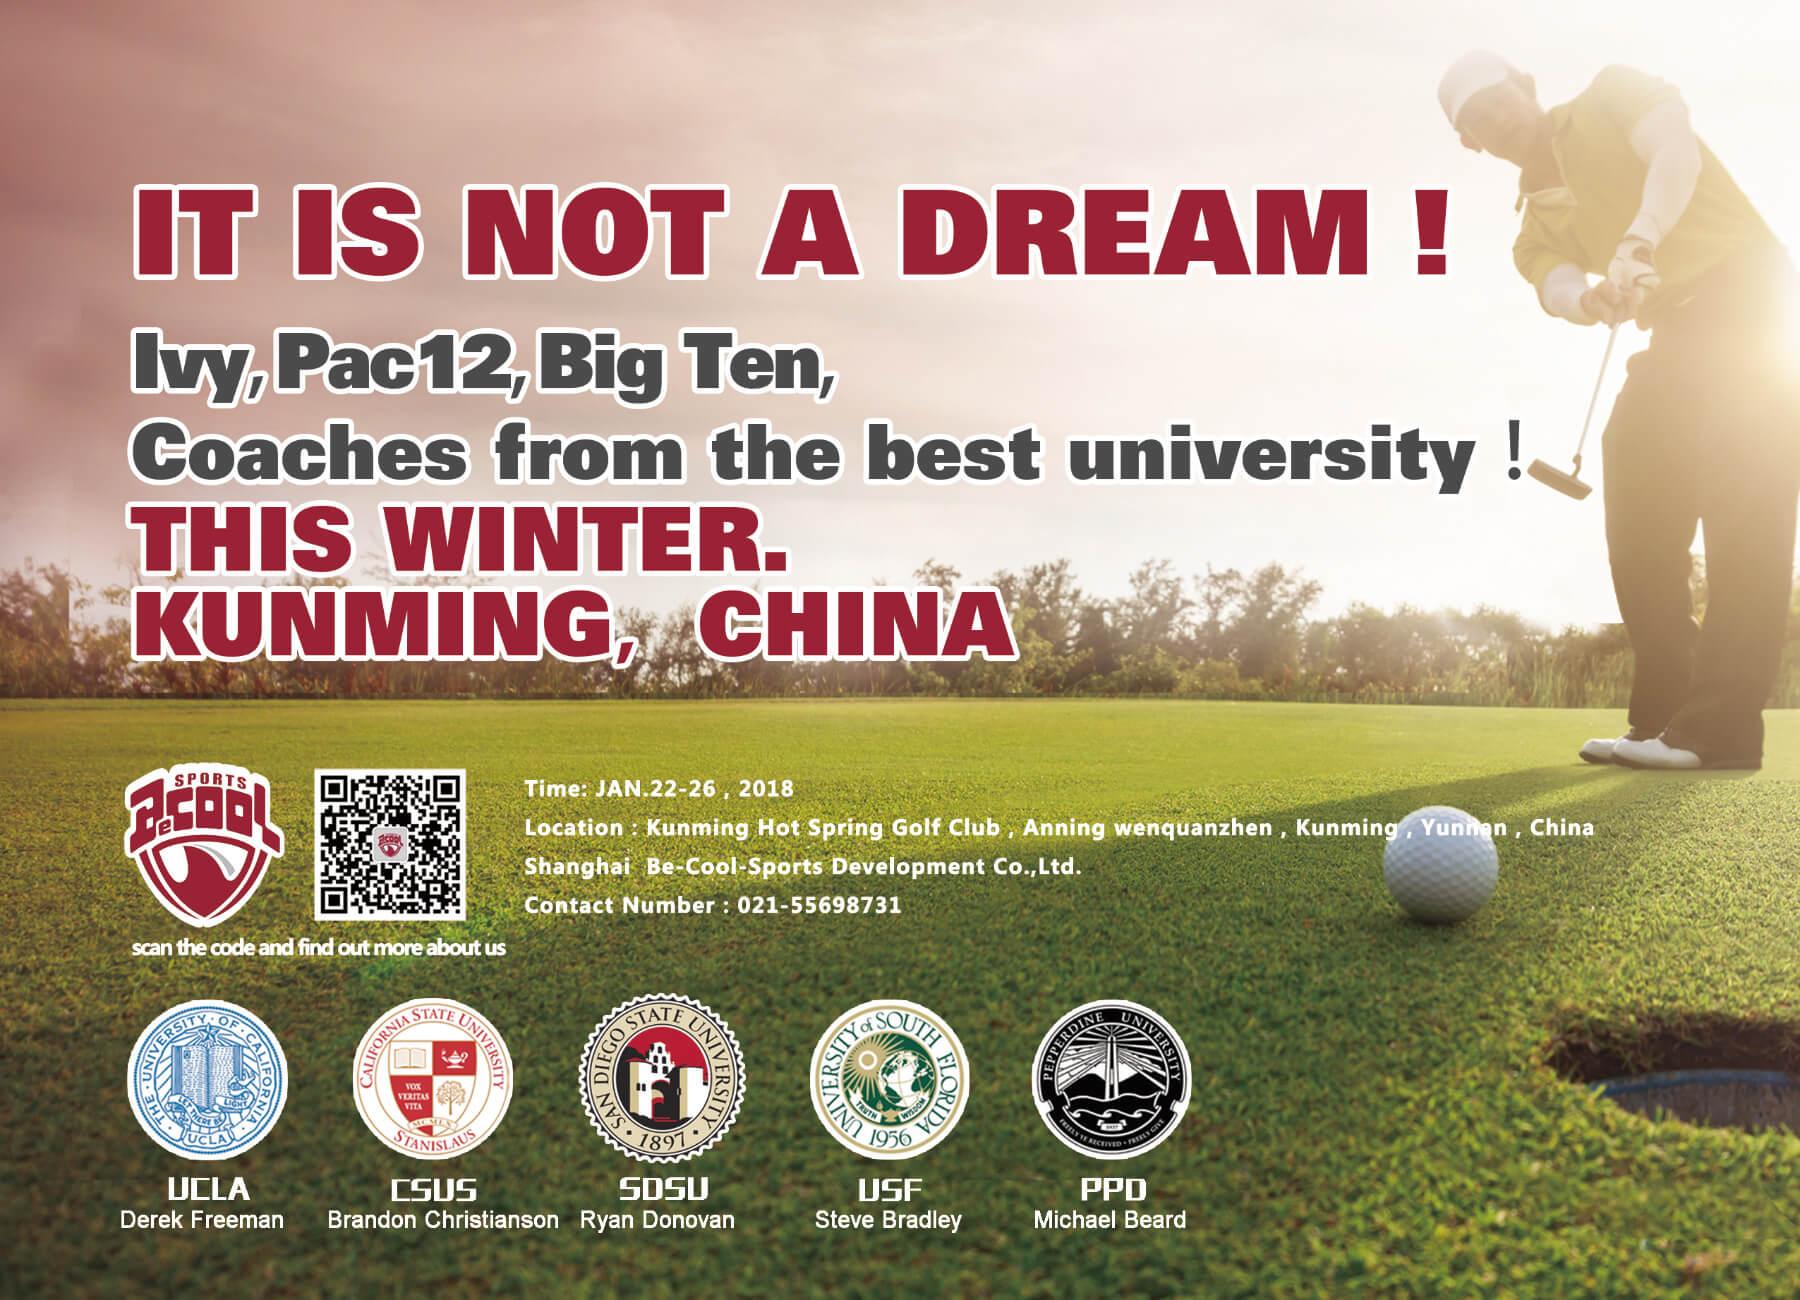 HJGT B Cool best university its not a dream